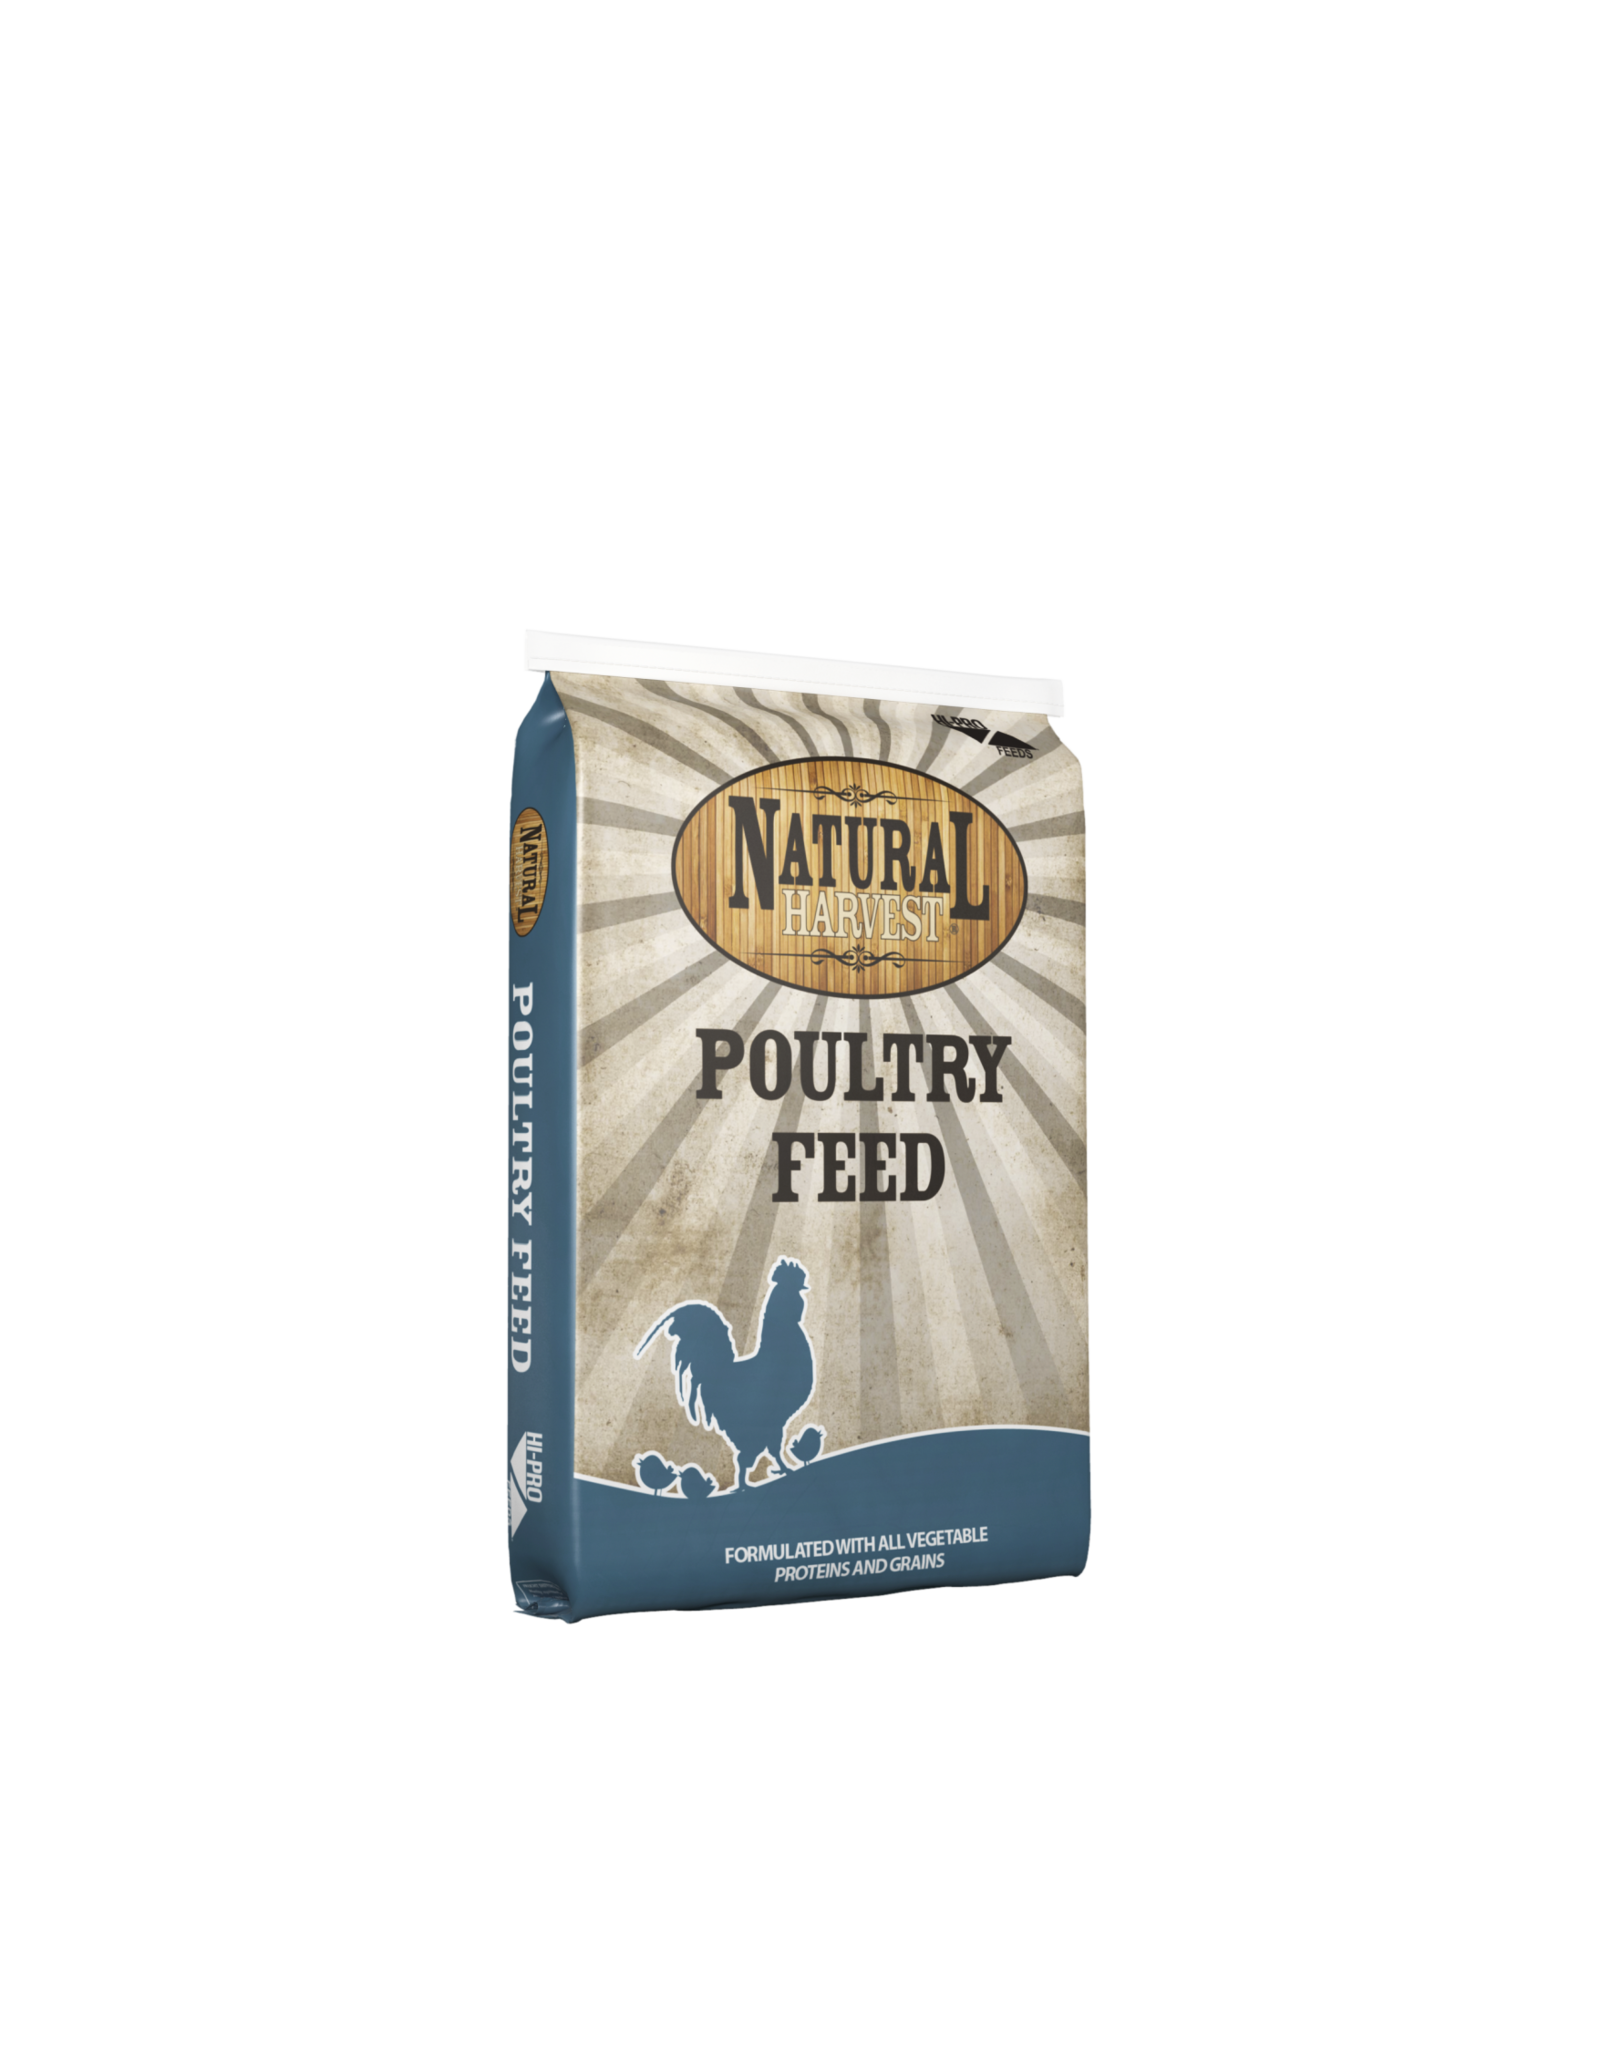 Natural Harvest Natural Harvest Non-GMO 15% Step 4 Poultry Developer Crumbles 20KG